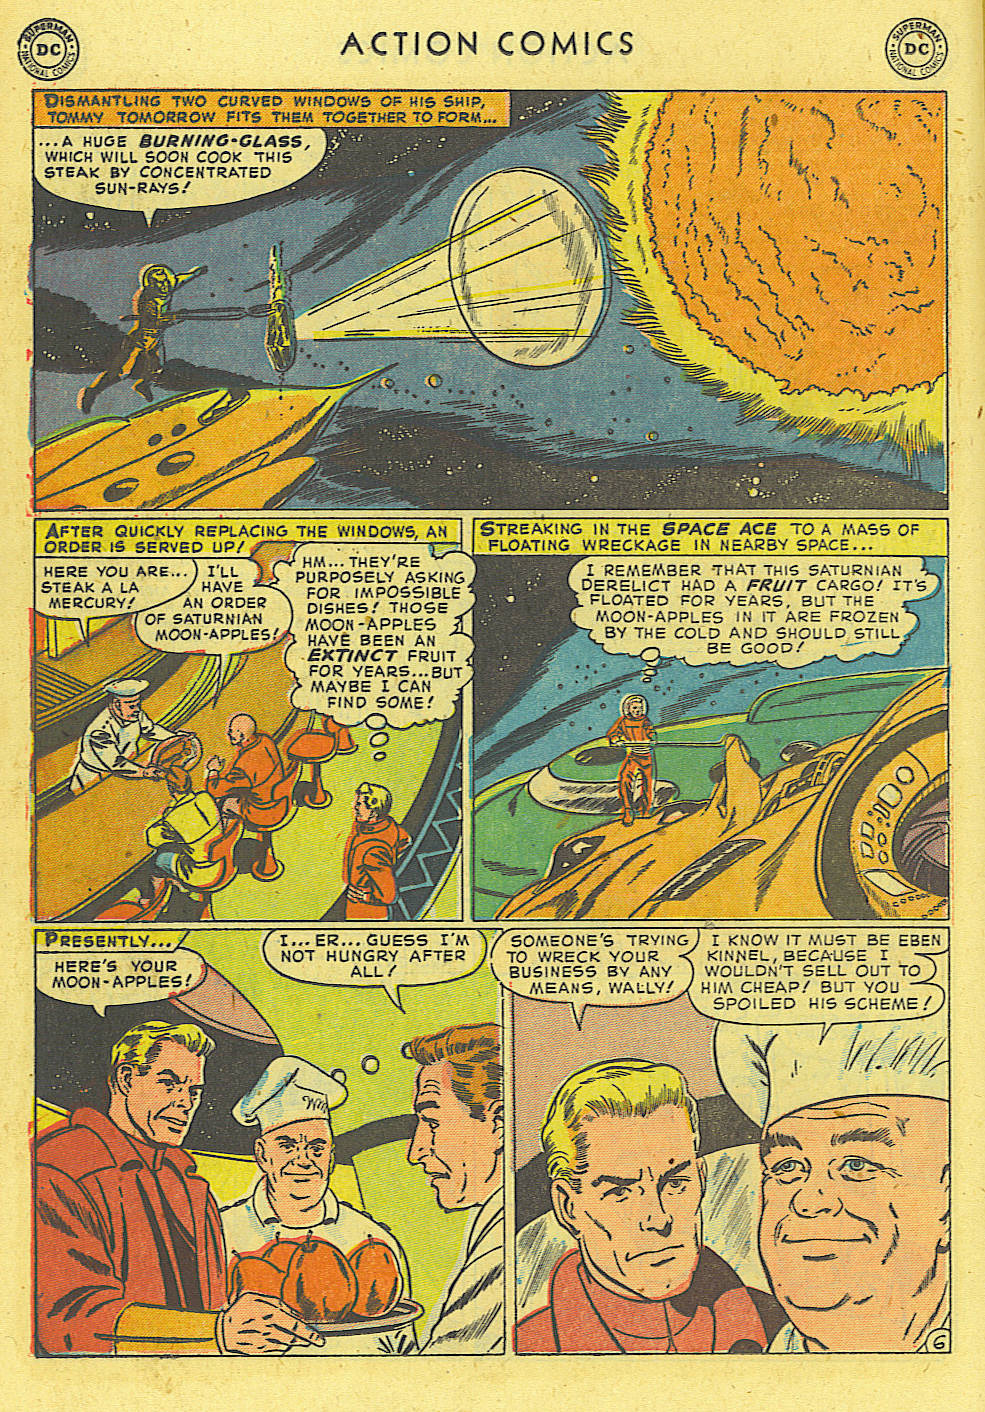 Action Comics (1938) 162 Page 16